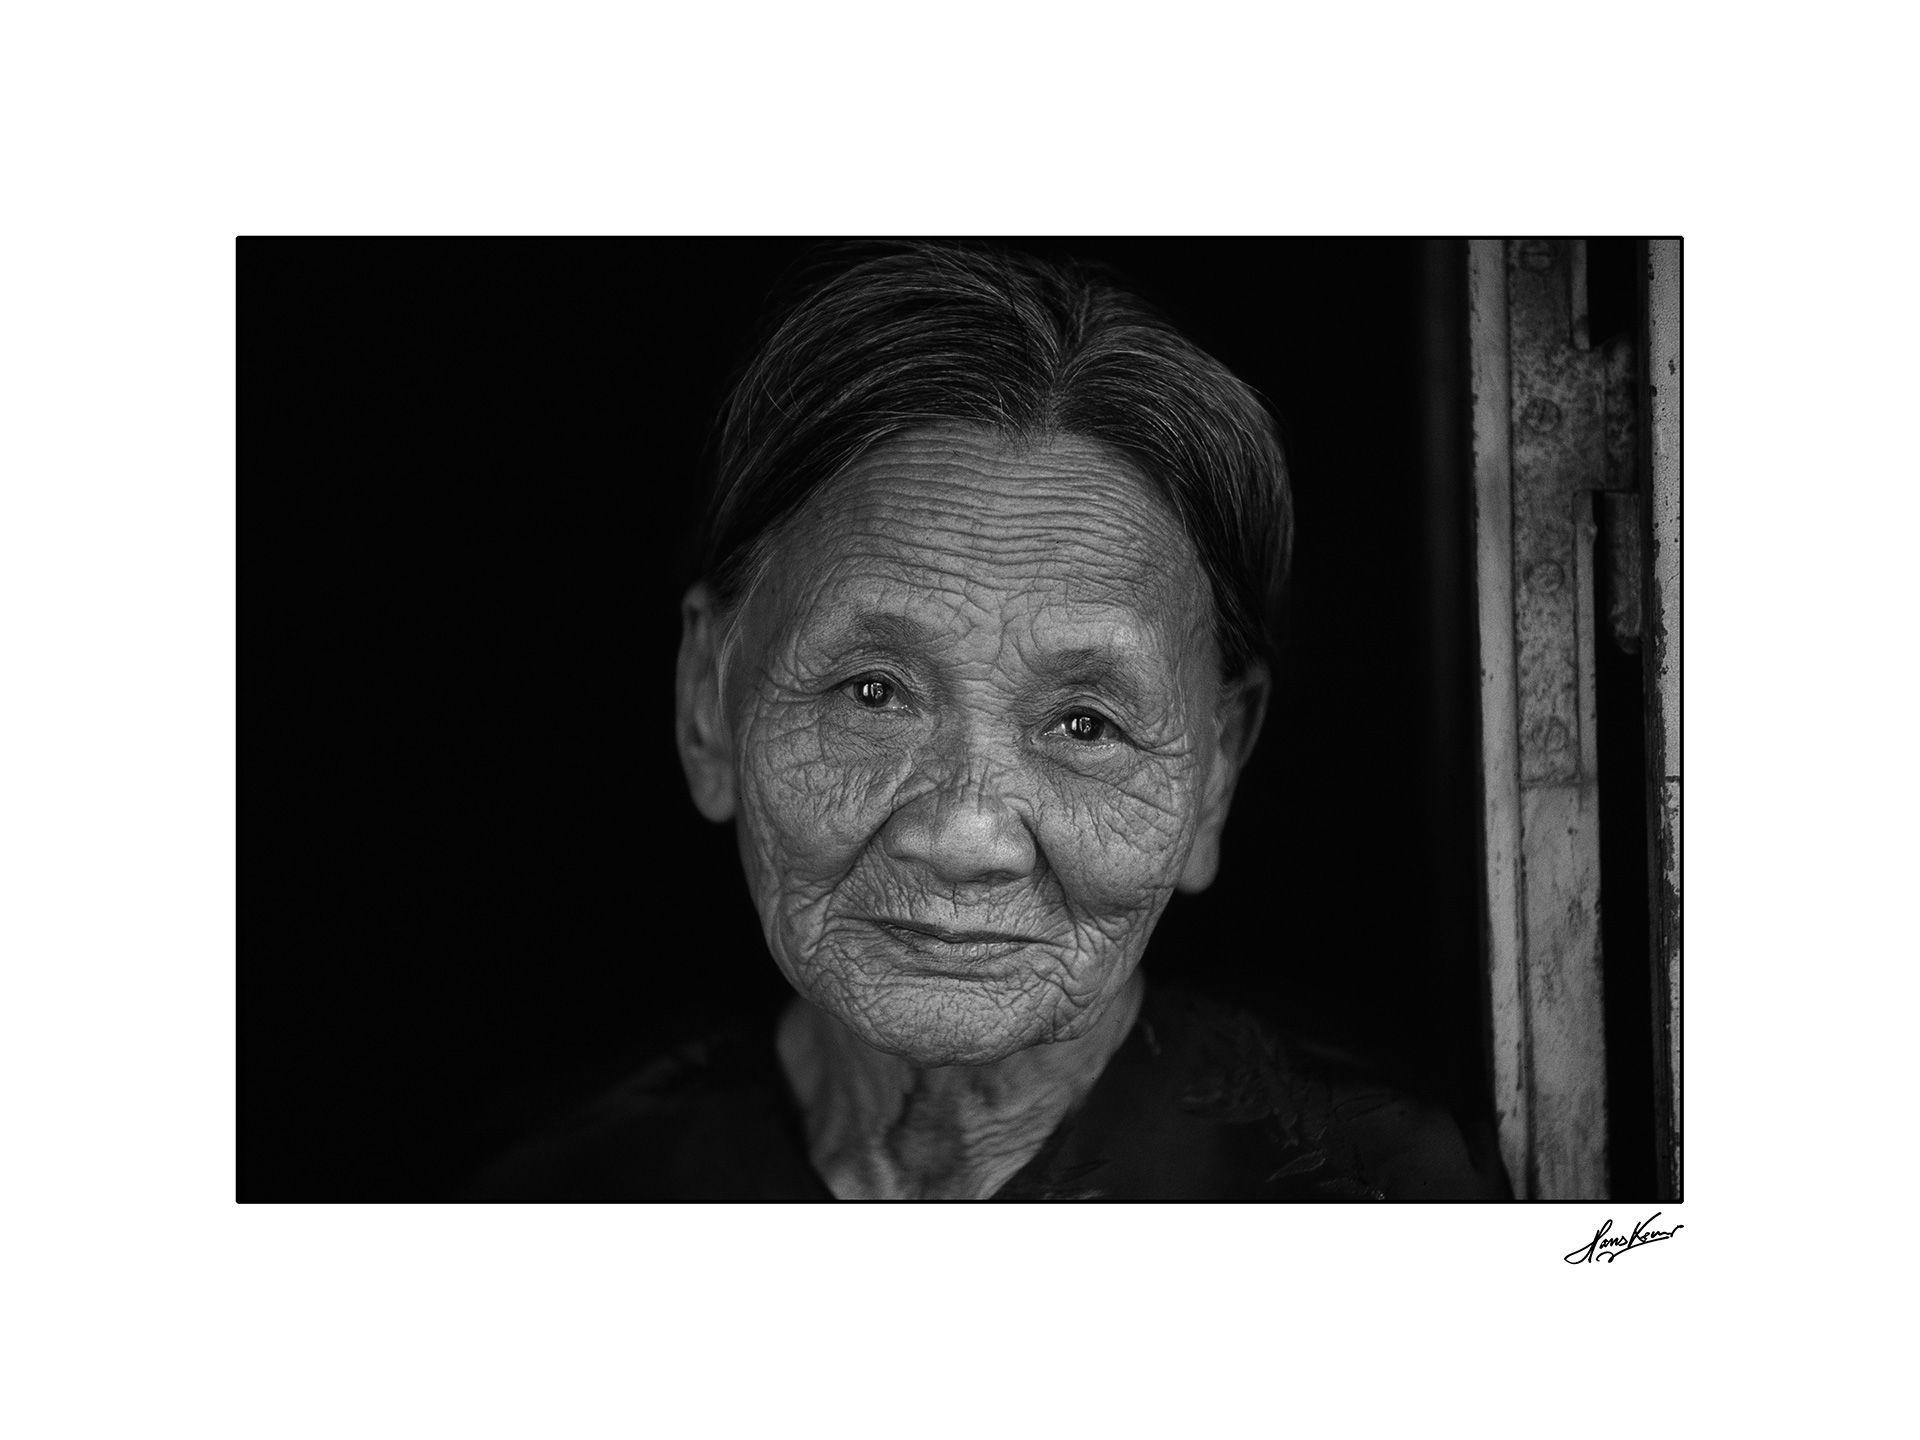 Portrait of a woman in Hoi An, Vietnam, 2000